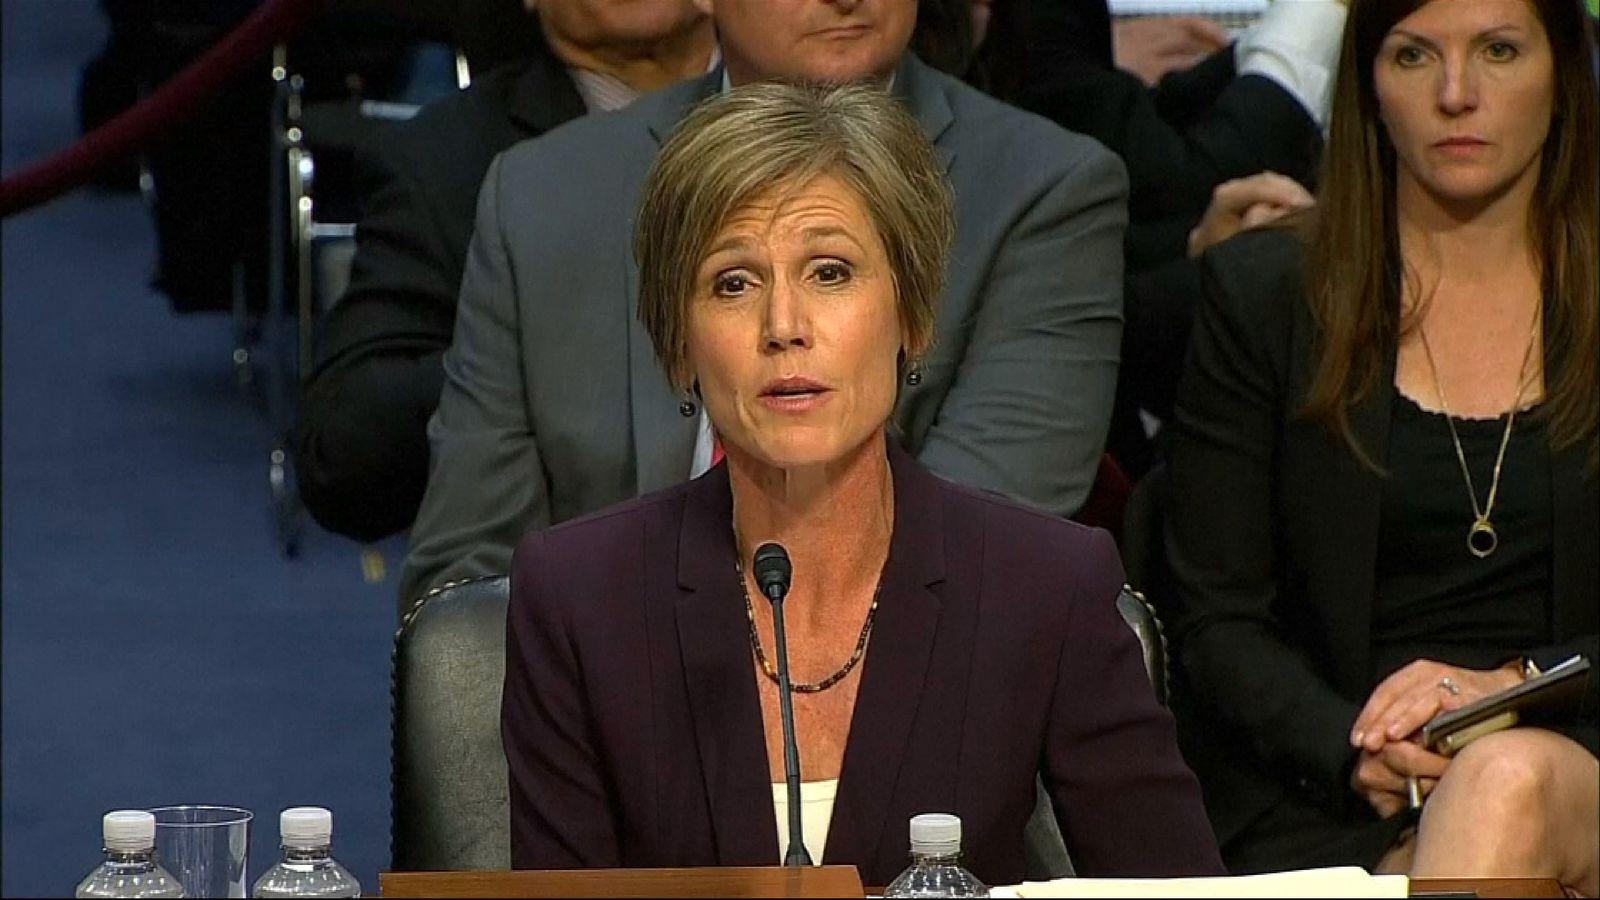 Ms Yates told senators her department believed General Flynn was compromised